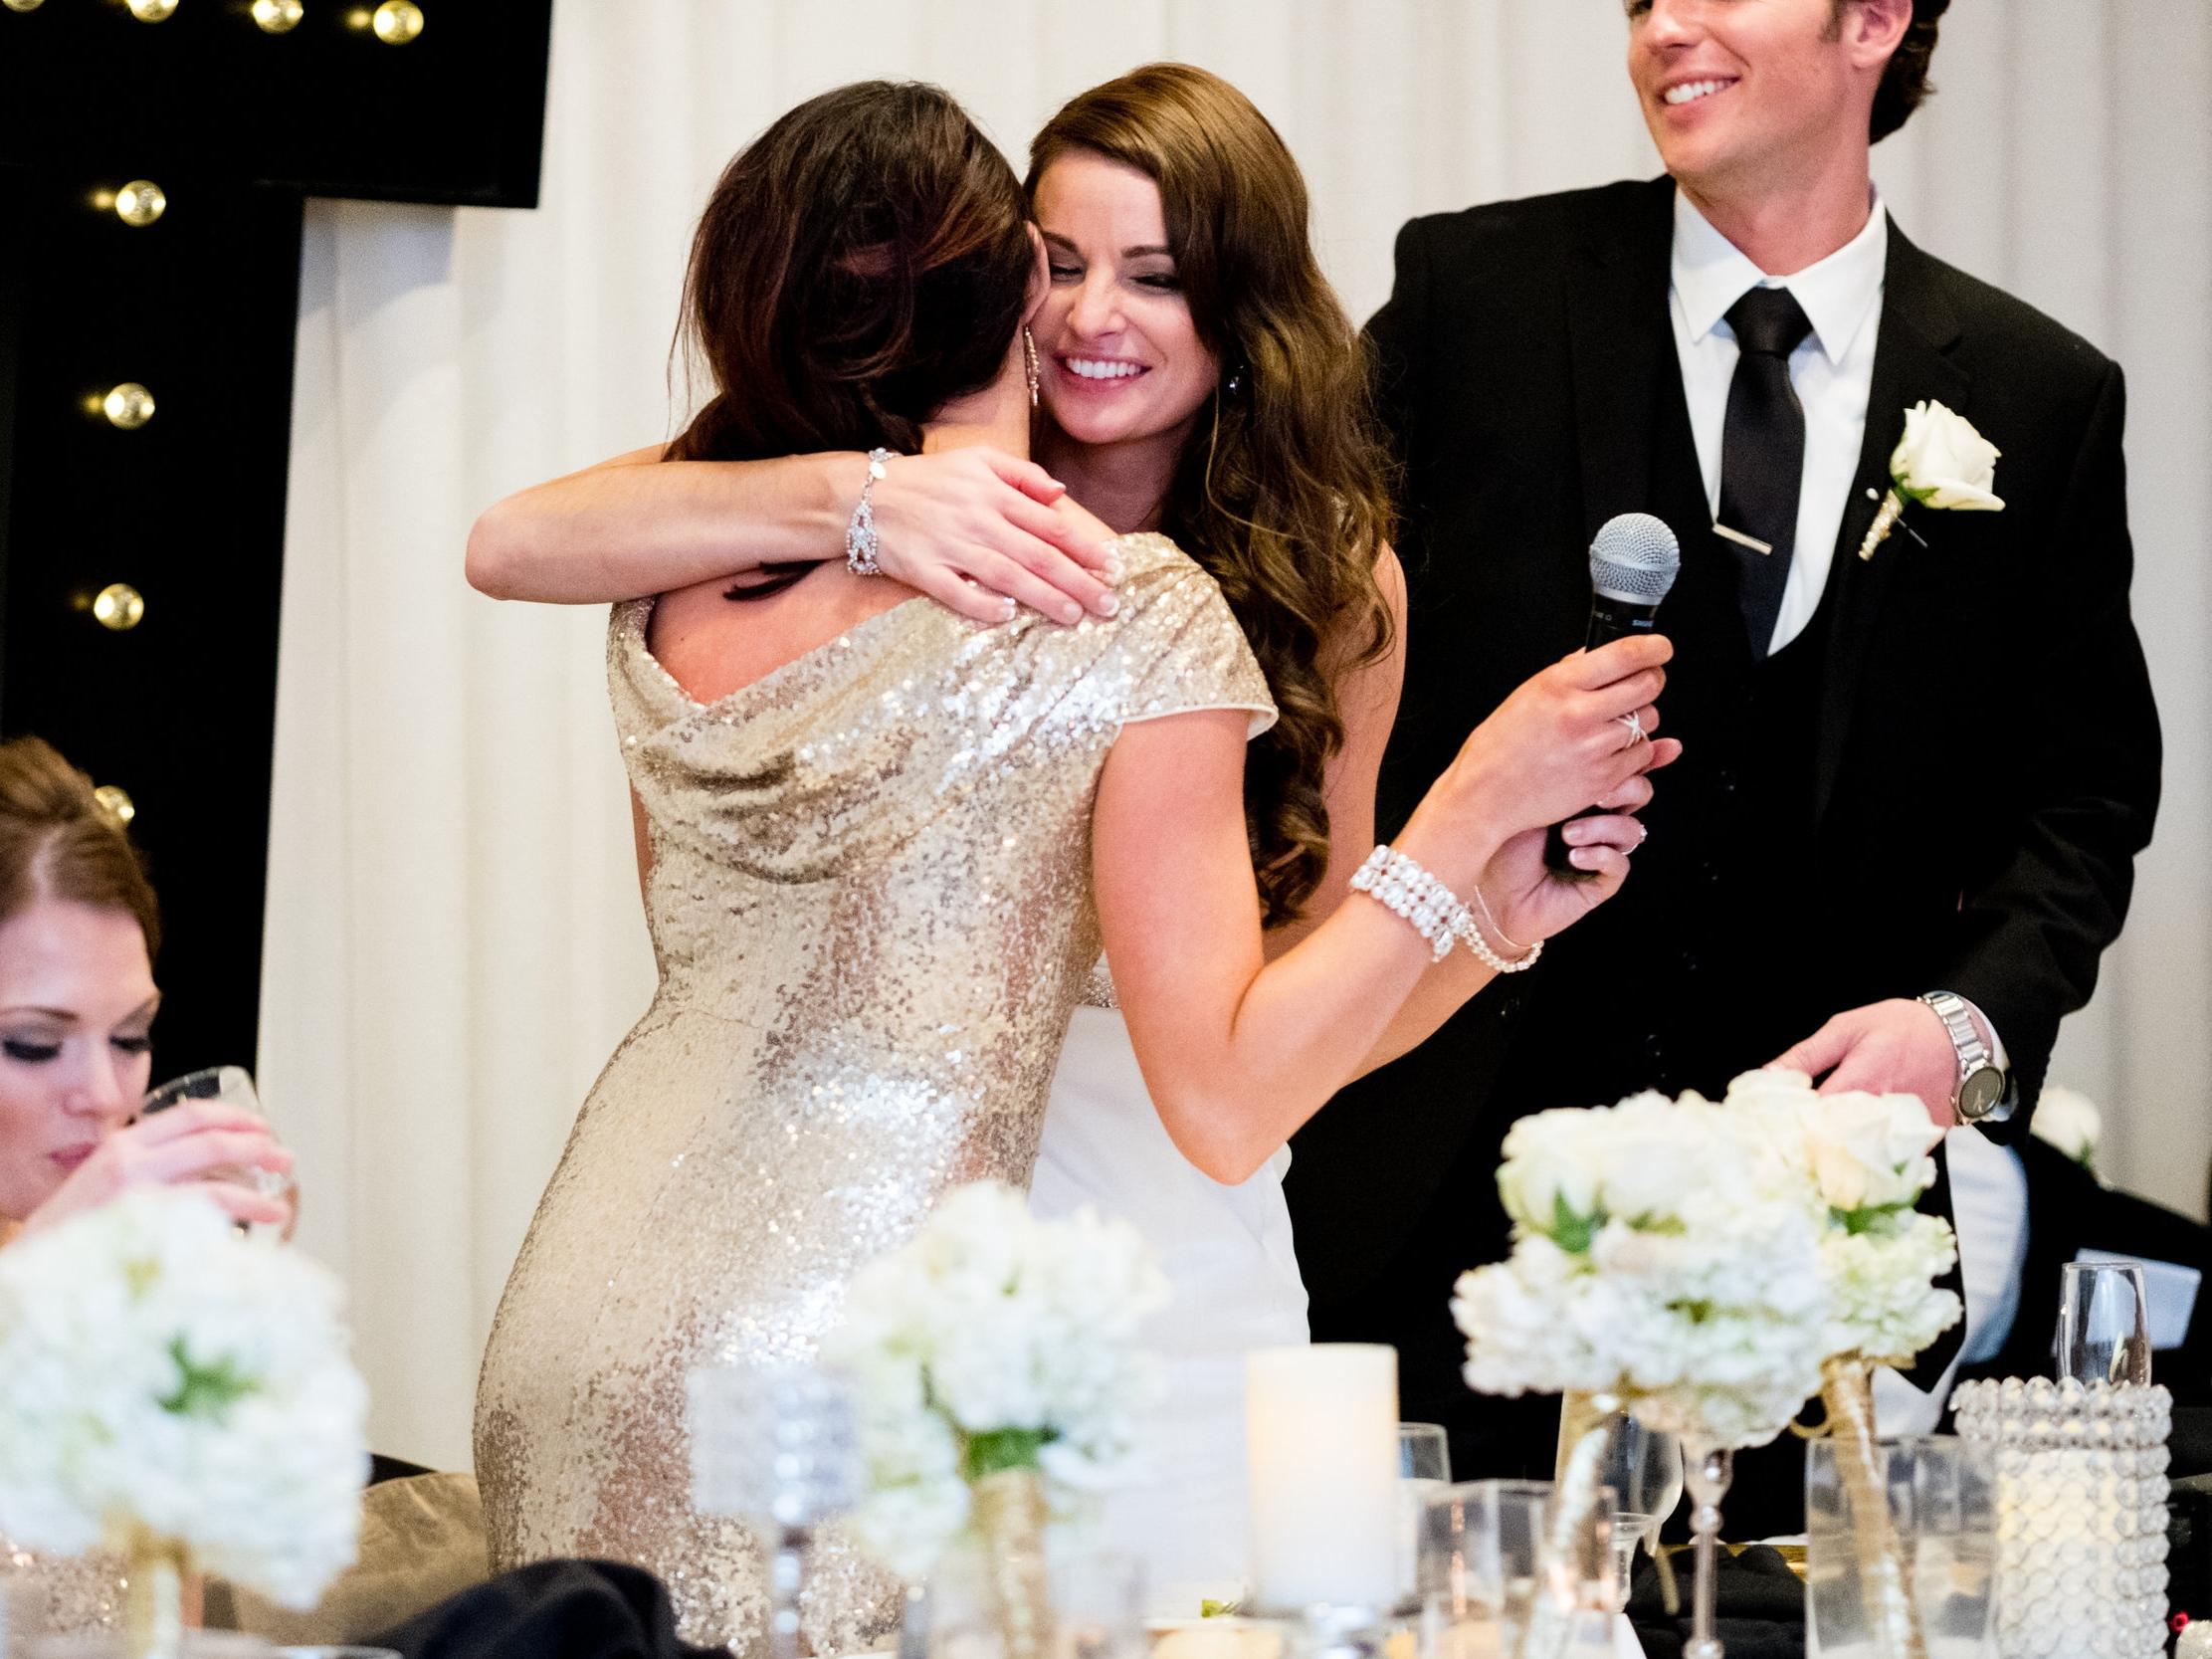 brainerd mn wedding reception maid of honor speech